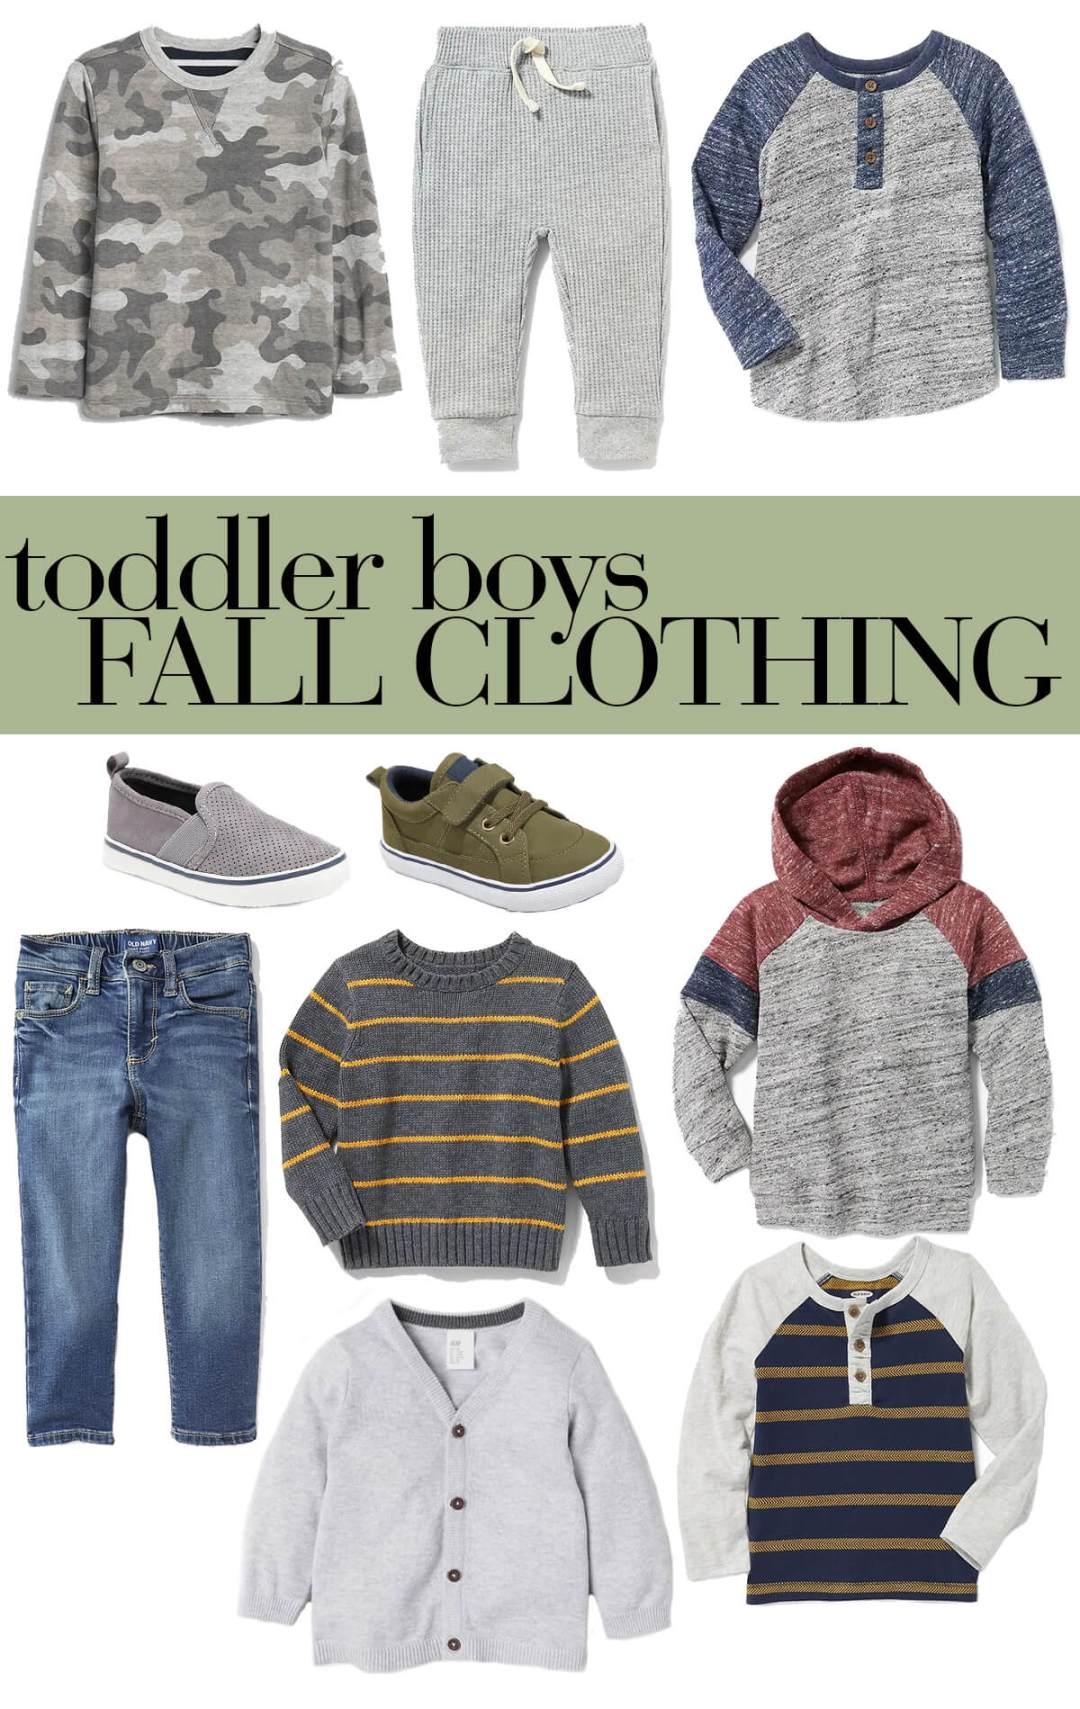 toddler boys fall clothing